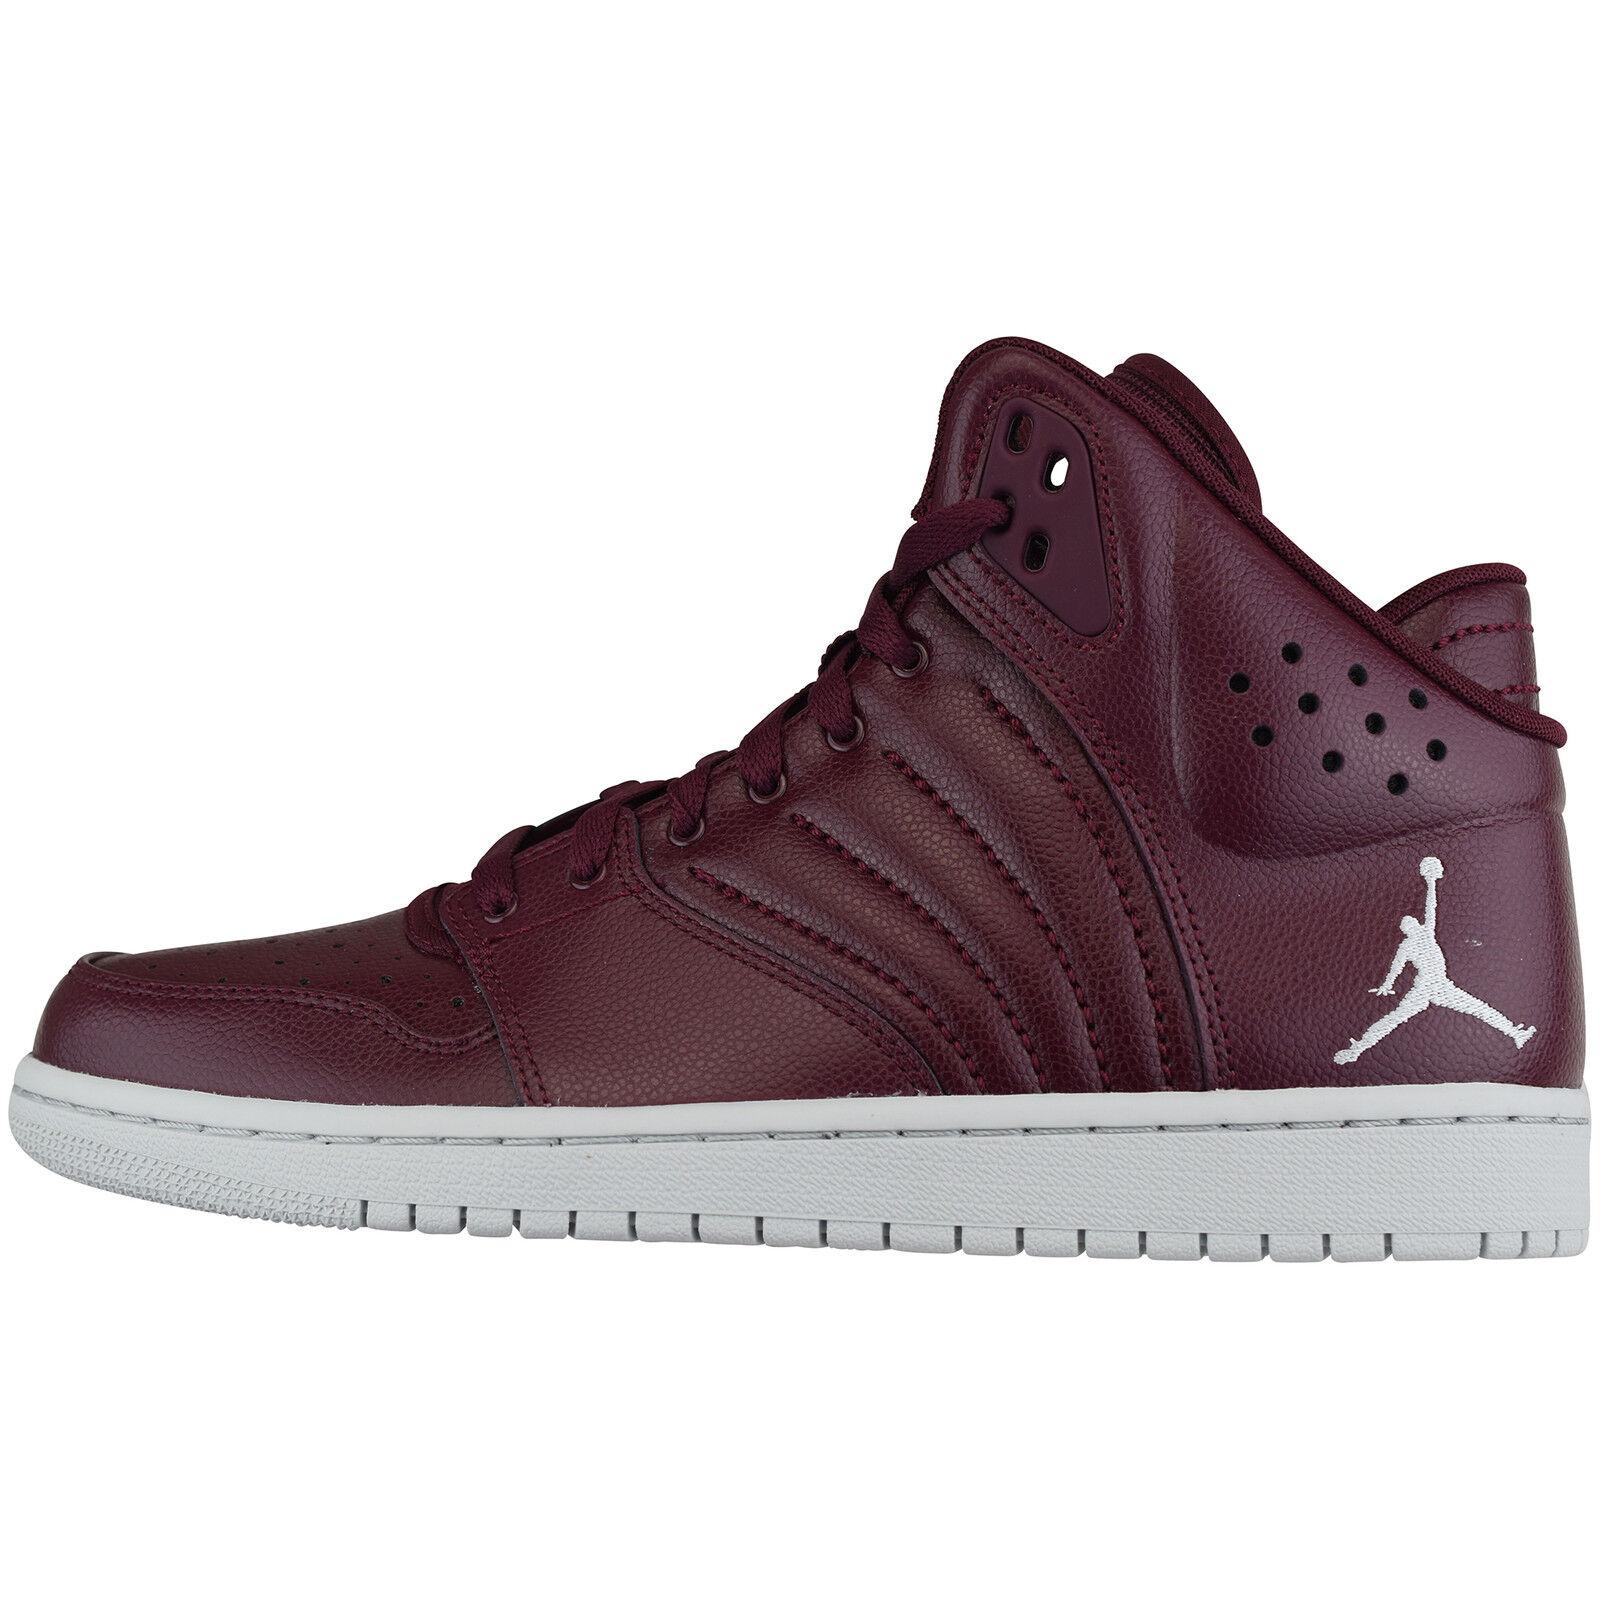 Nike Baloncesto Air Jordan 1 Flight 4 820185-600 Baloncesto Nike Zapatillas de correr DEPORTIVAS b0d54a